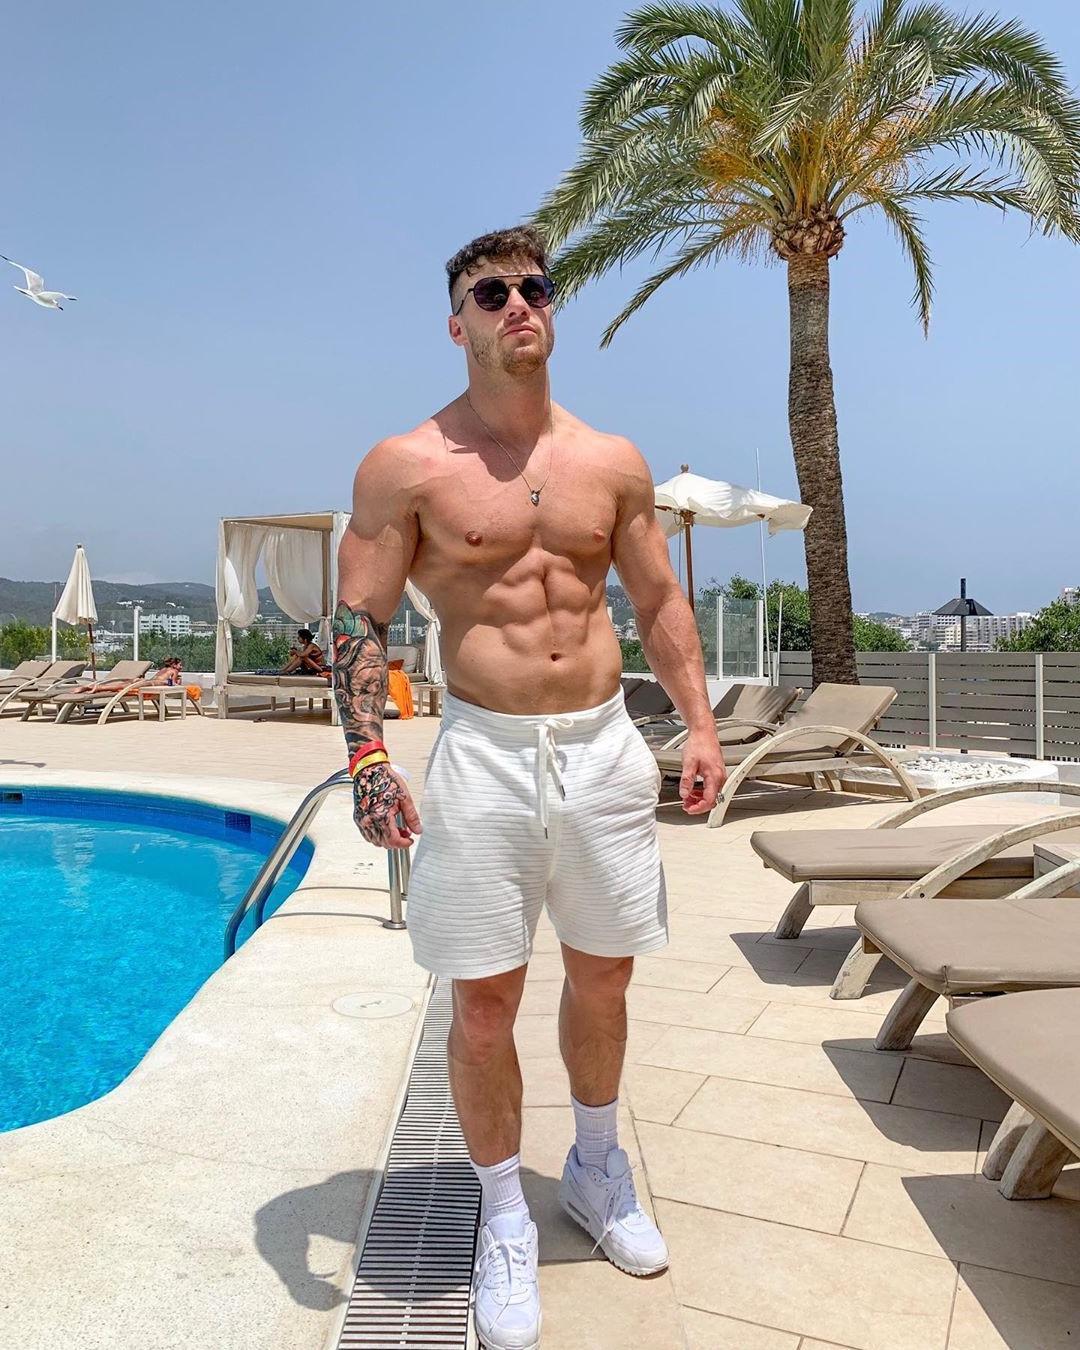 hot-pool-dude-pointy-hard-nipples-arm-tattoo-abs-hunk